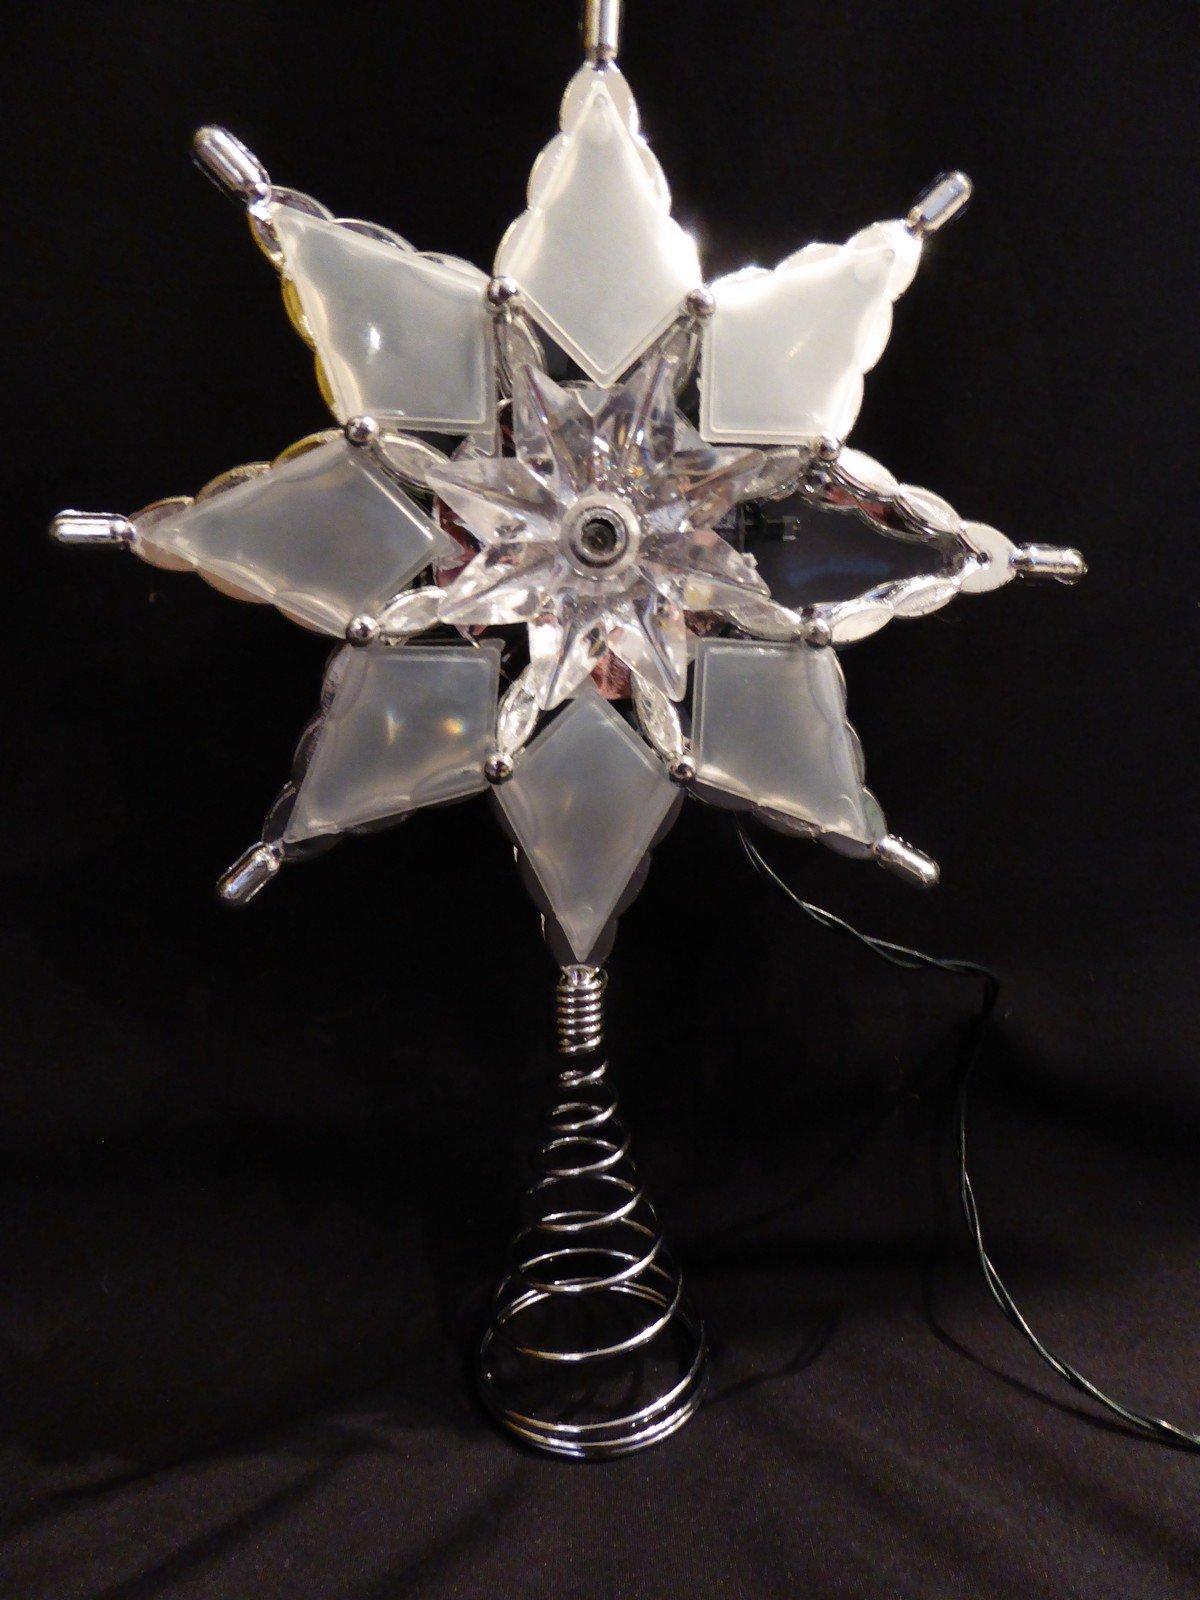 Weihnachtsschmuck-27-cm-gro-batteriebetrieben-LED-beleuchtet-Flower-Star-Innen-Christbaumspitze